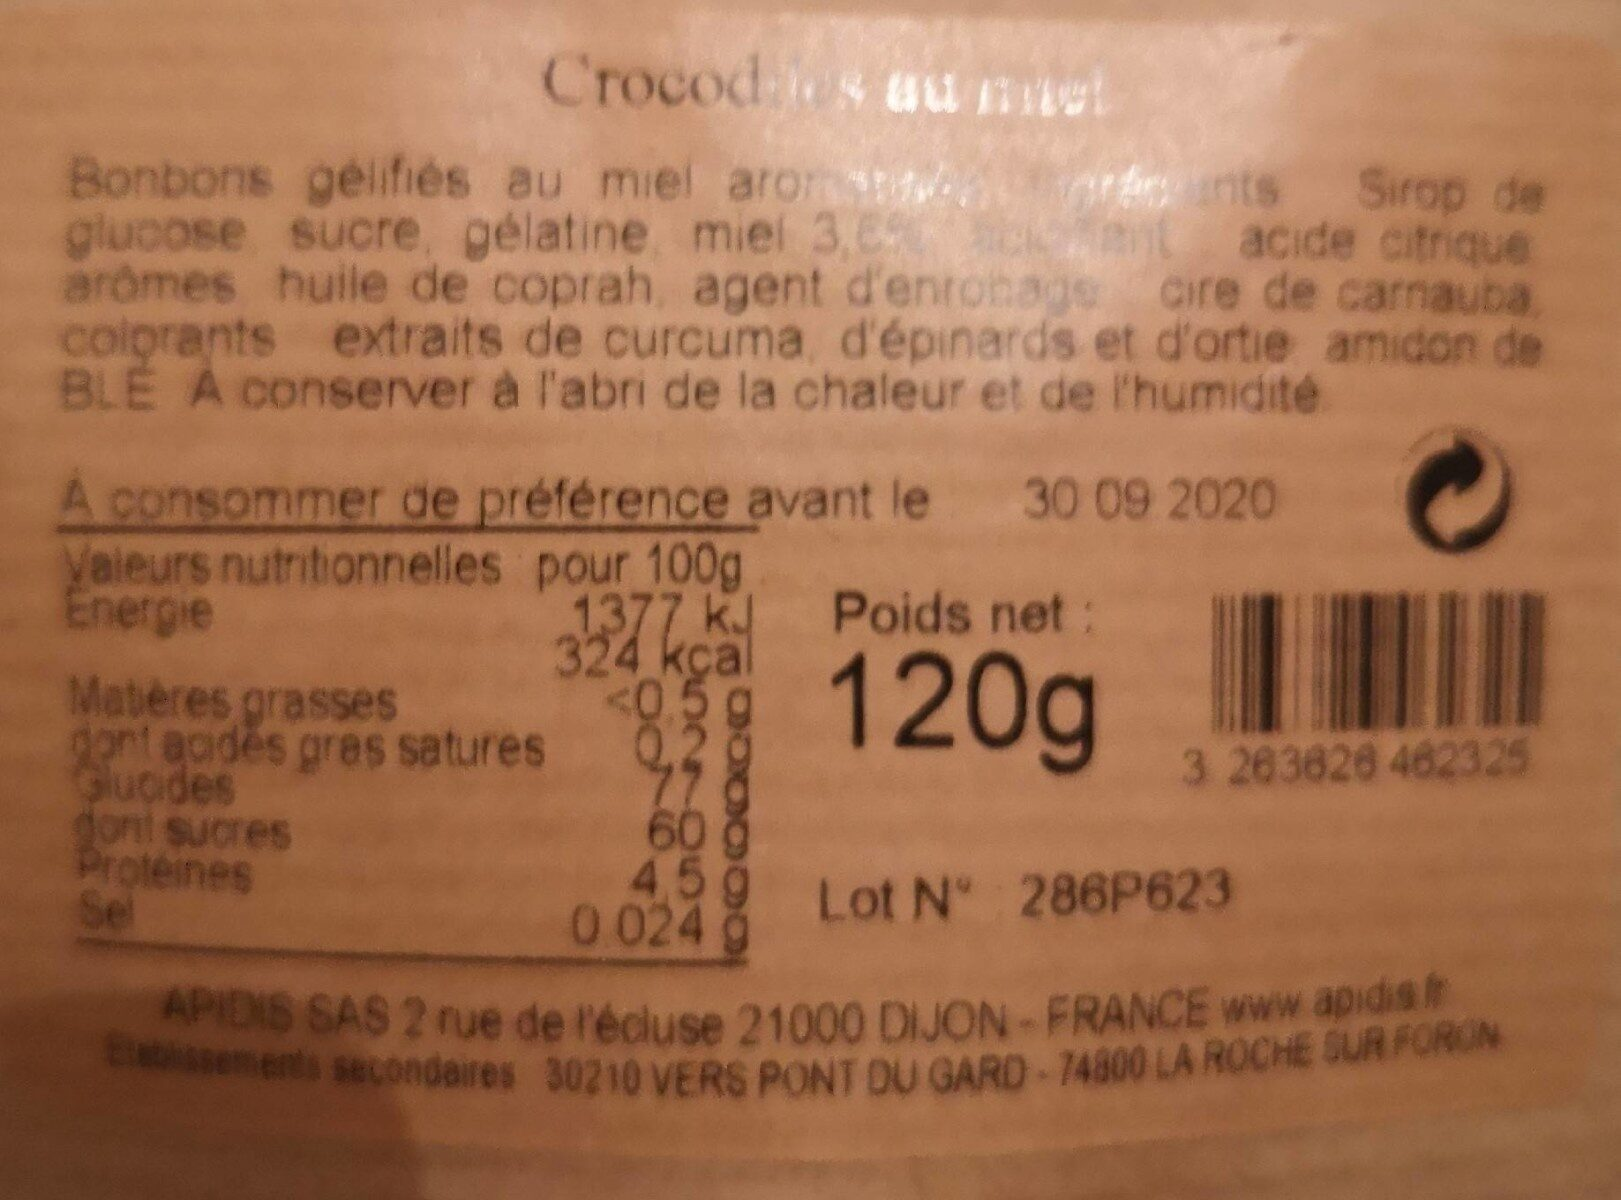 Bonbons Crocodiles - Informations nutritionnelles - fr